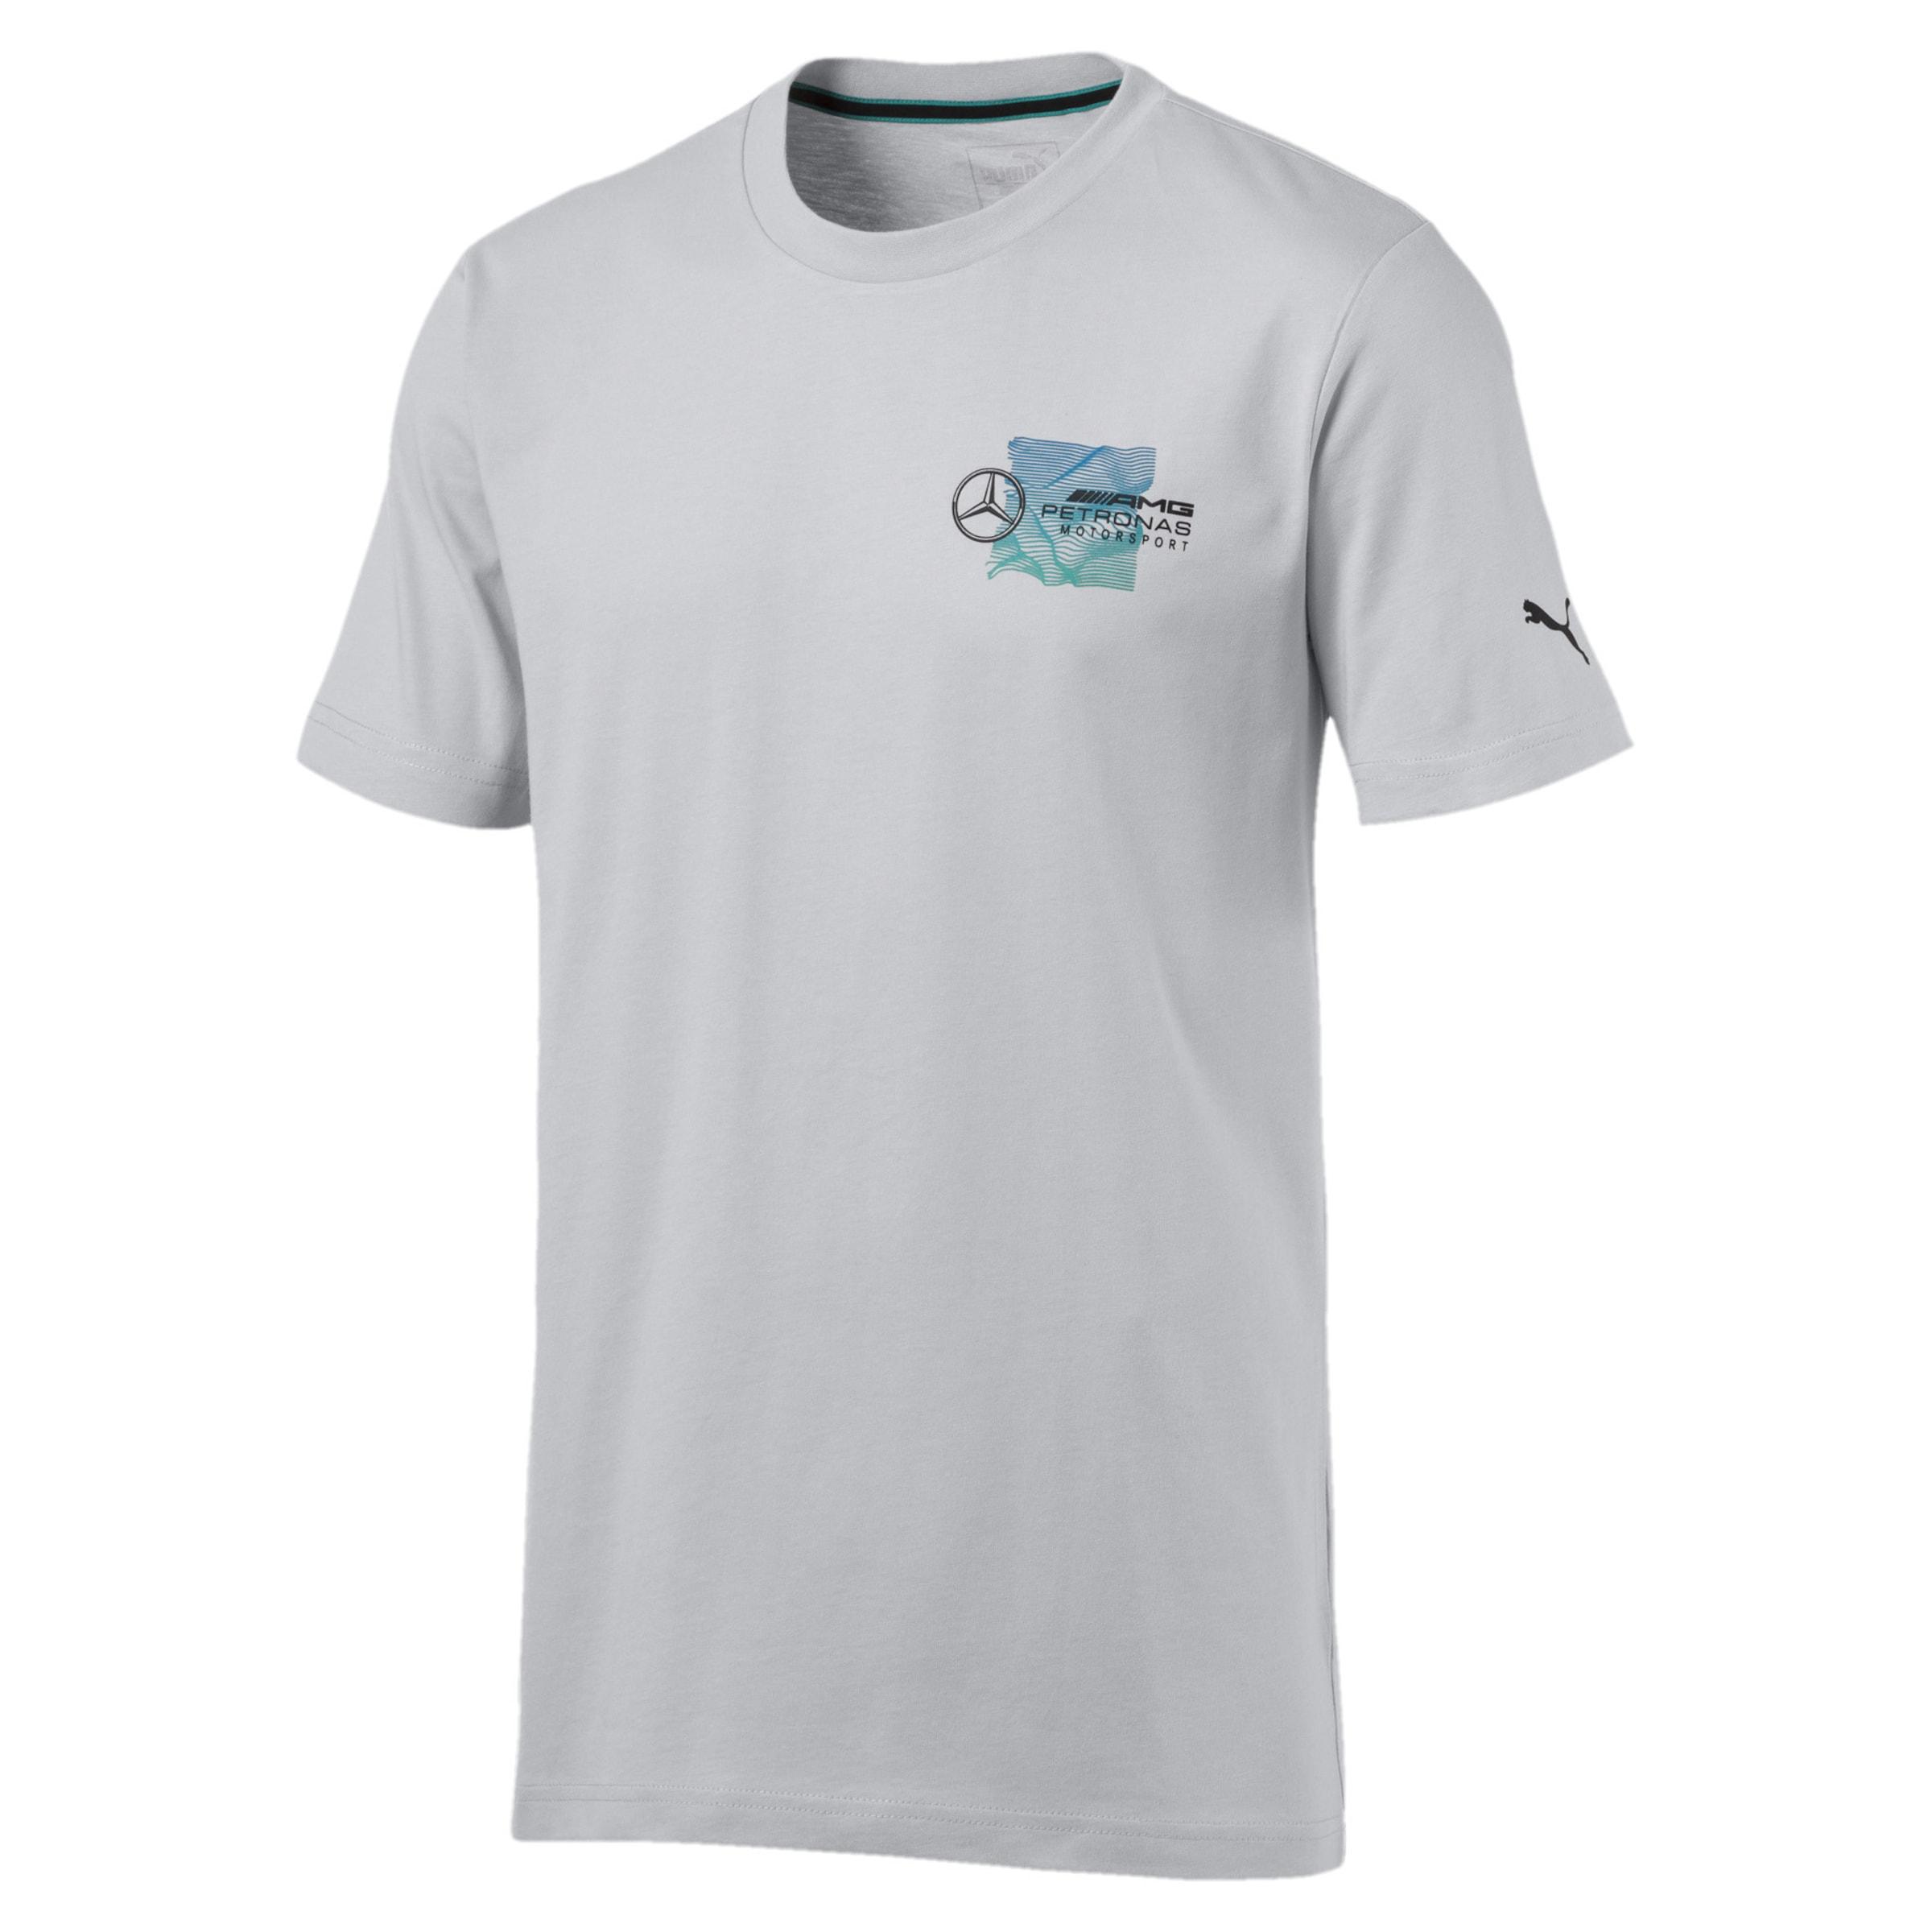 Puma Amg In T shirt Petrol Motorsport' 'mercedes Petronas BlauGrau kOPXNn80w